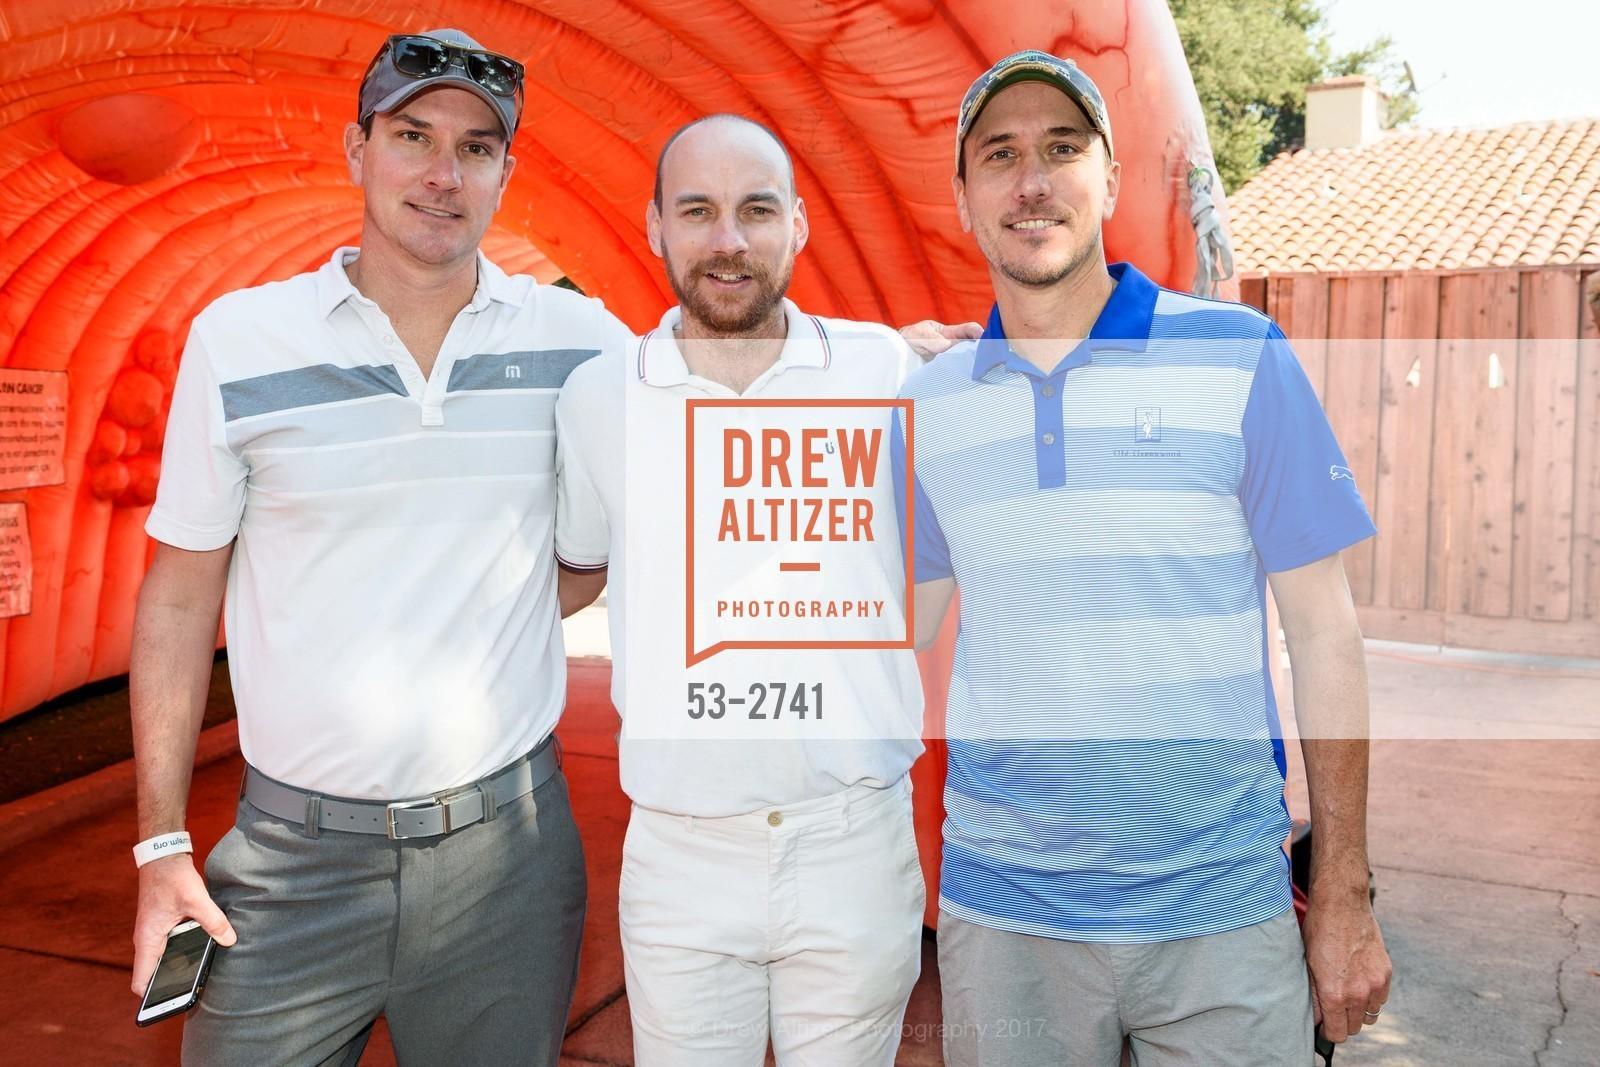 Brent Hauser, Michael Stember, Brad Hauser, Photo #53-2741